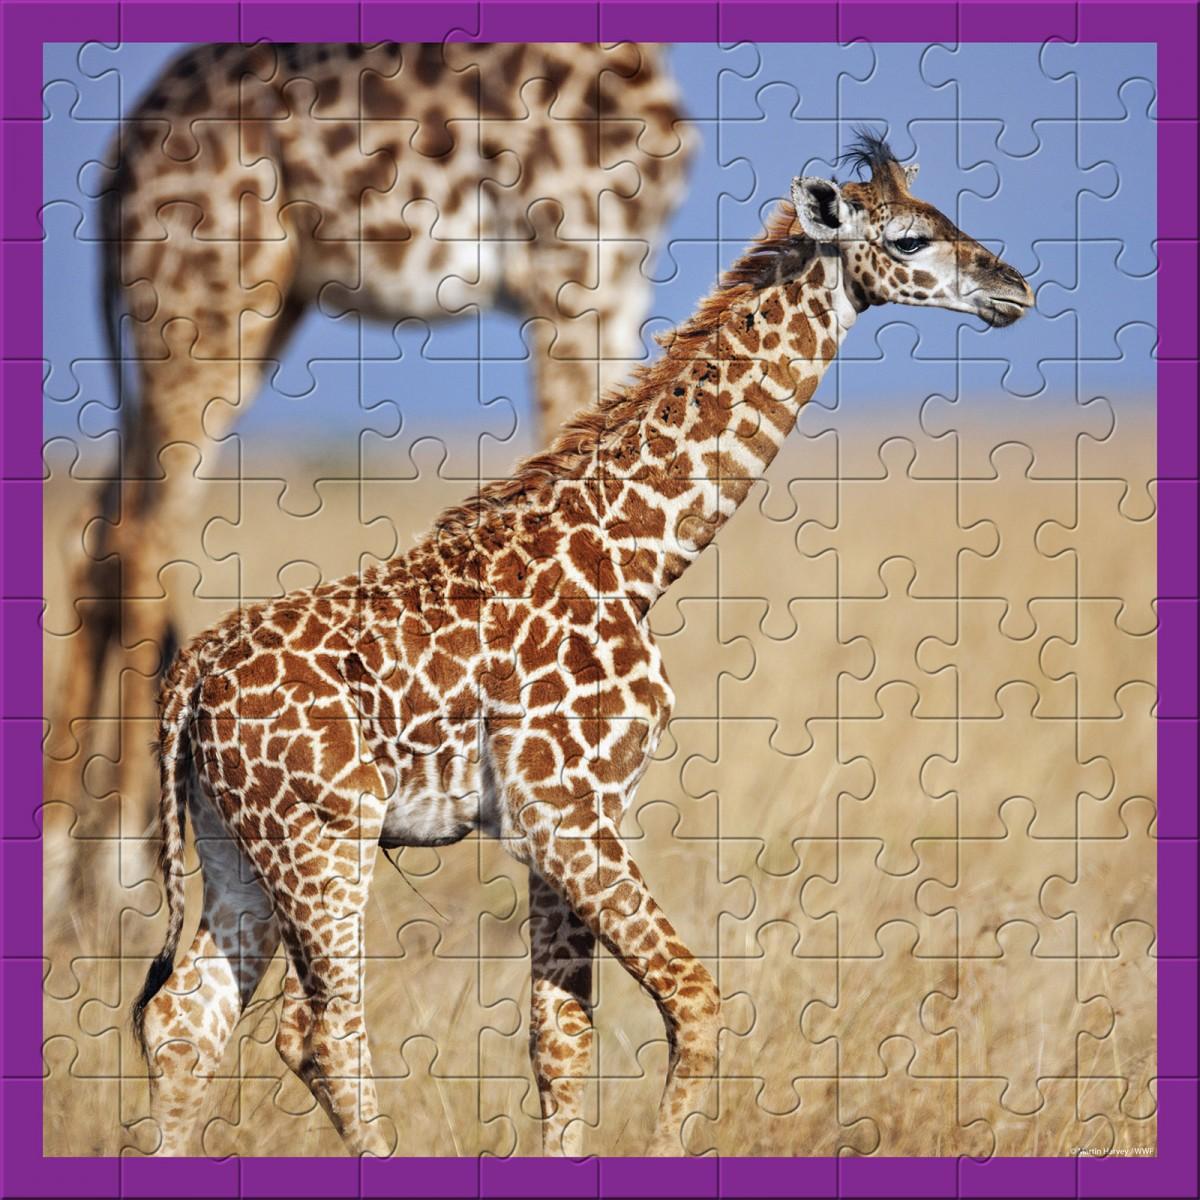 Wwf Animal 100 Pc Puzzles Baby Giraffe Produkte